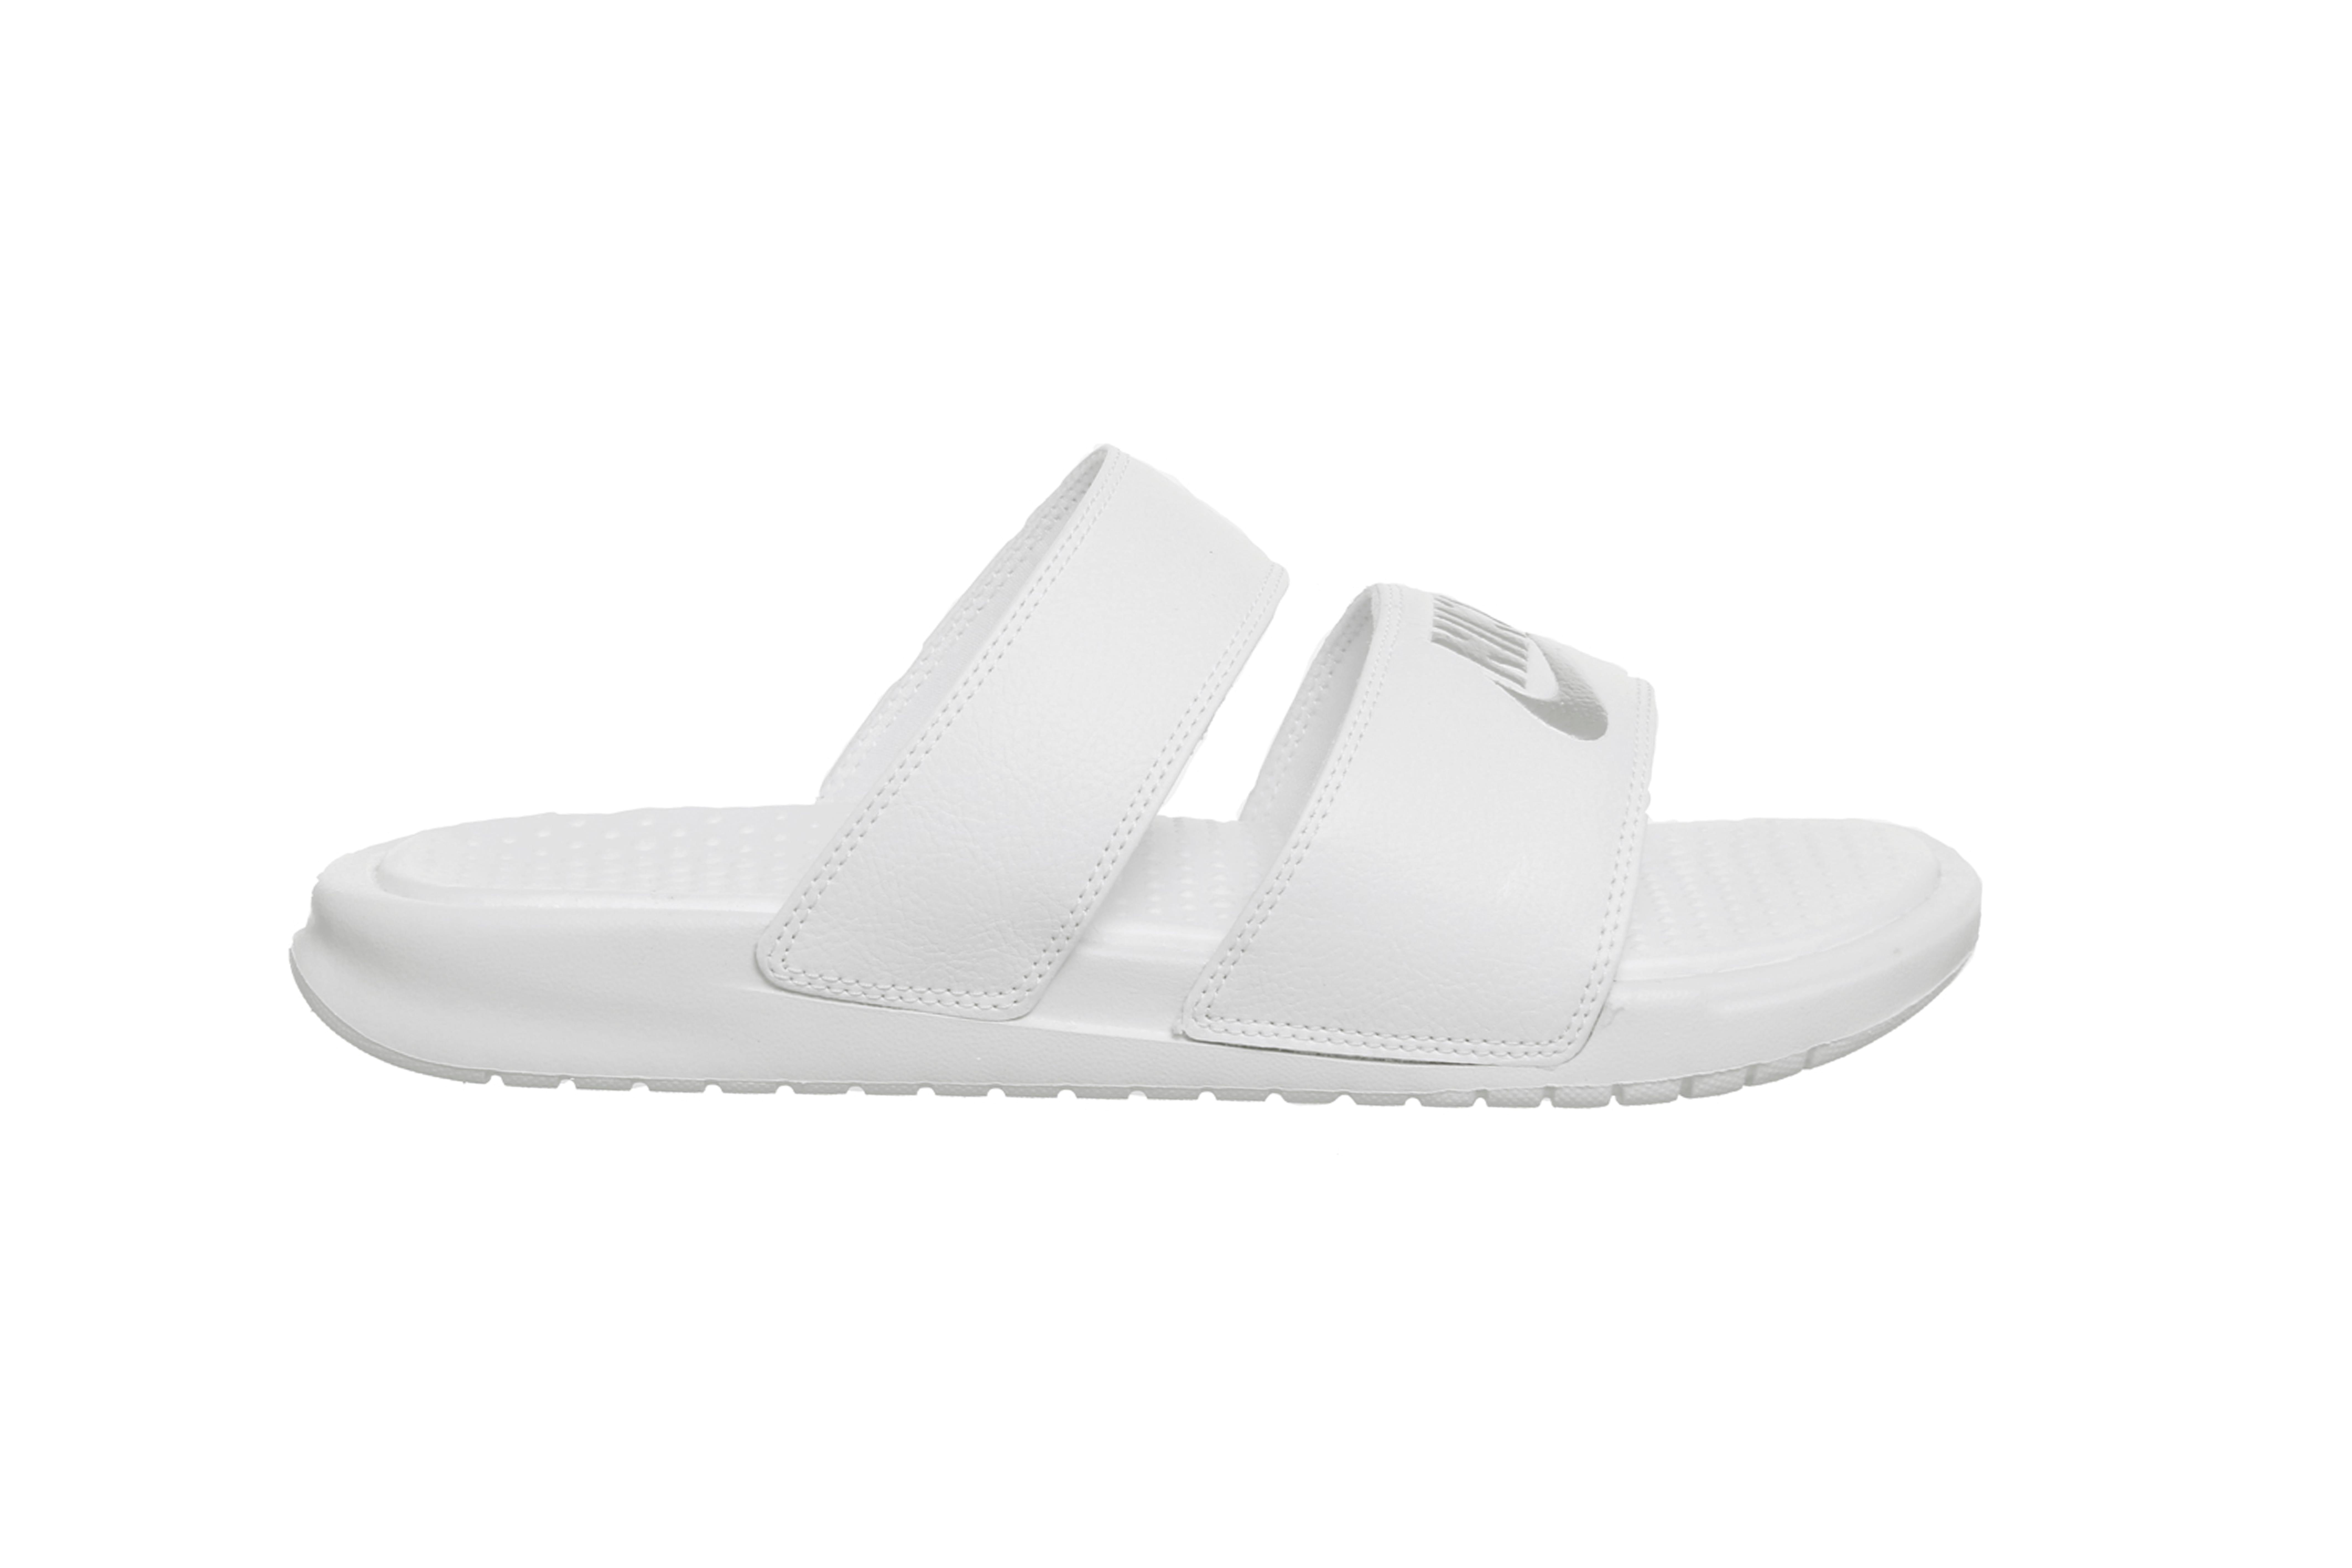 nike double strap slides price